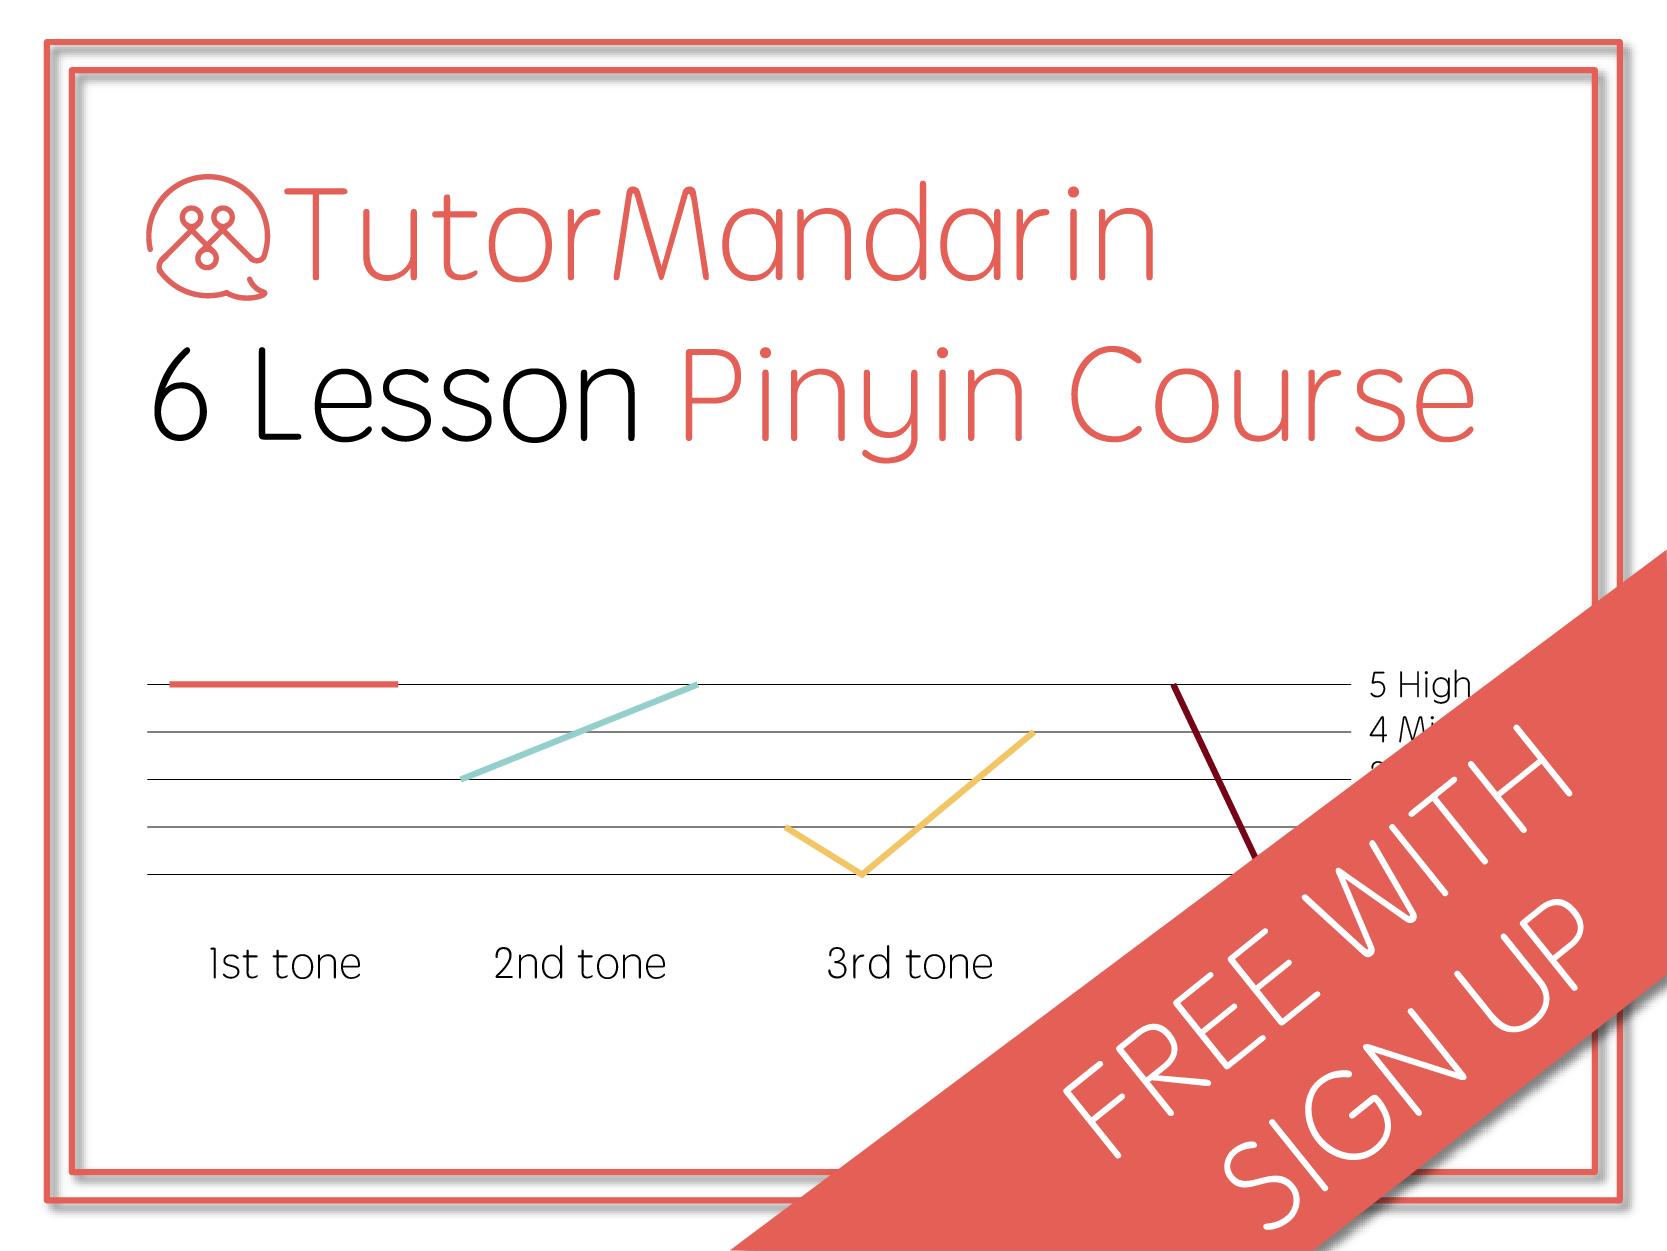 tutormandarin 6 lesson pinyin course learn chinese online tutormandarin online mandarin tutor. Black Bedroom Furniture Sets. Home Design Ideas